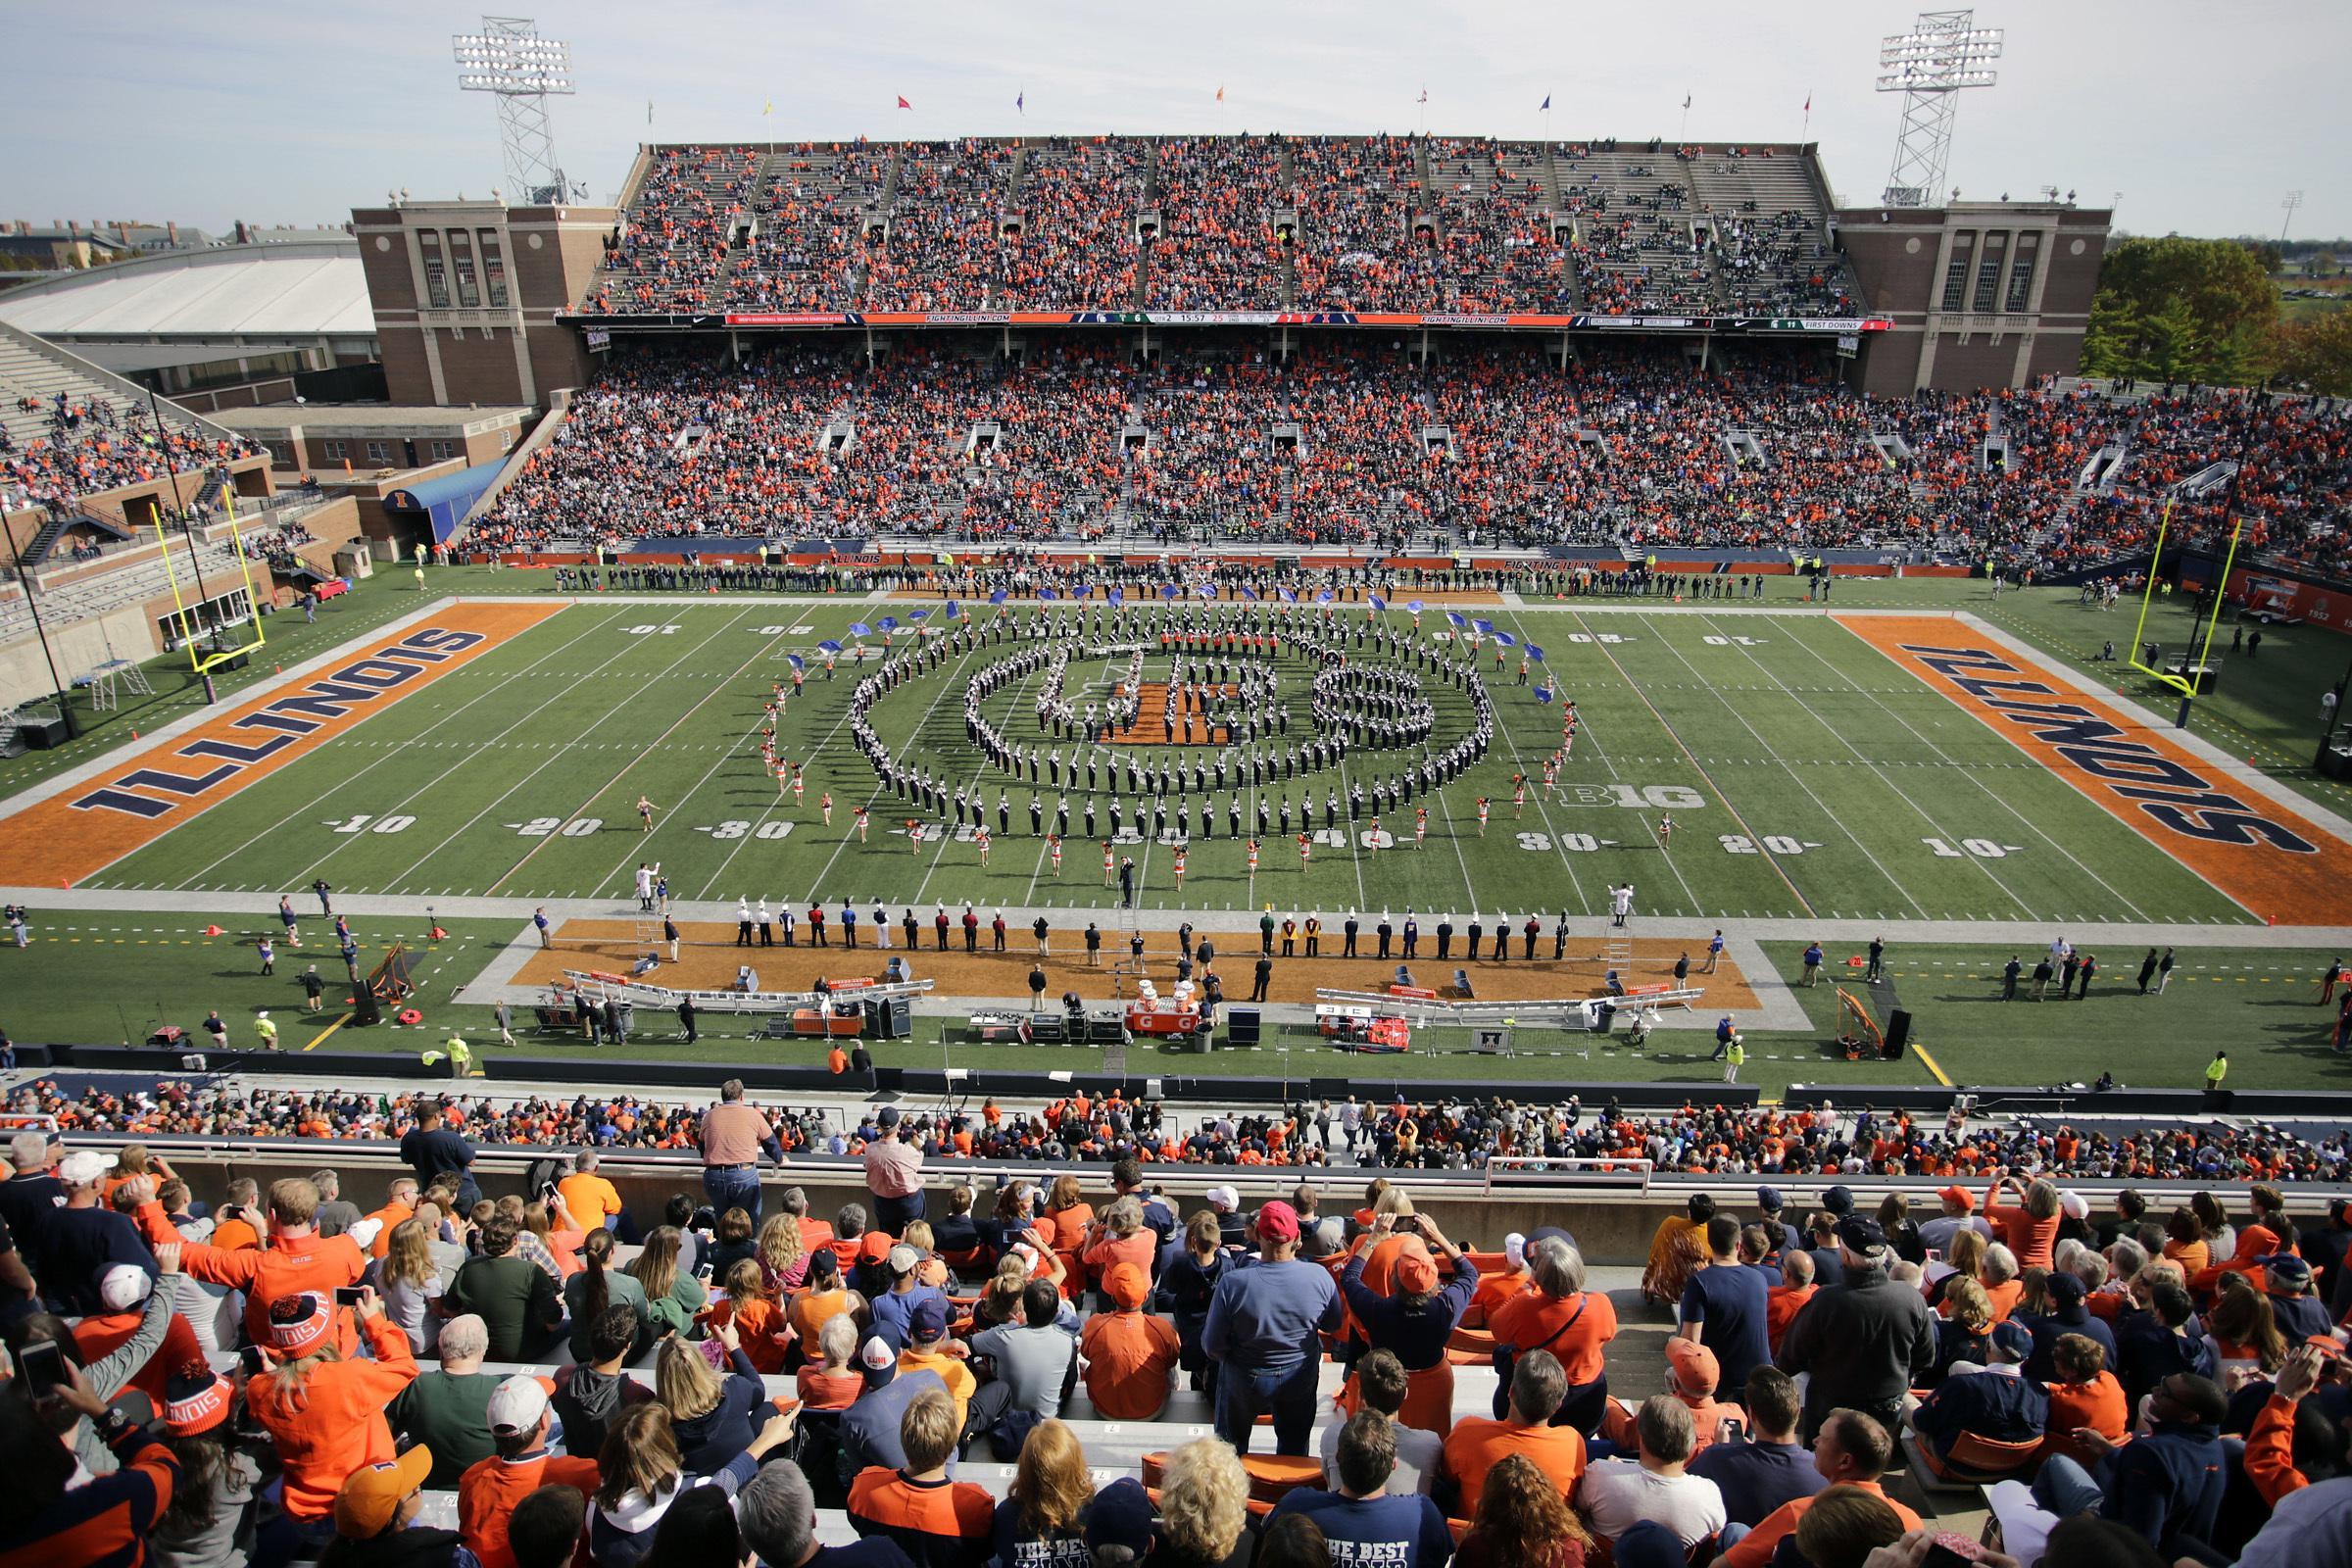 University Of Illinois At Urbana-Champaign Calendar 2020 Finally: ISU Football To Play Illini In 2020   WGLT